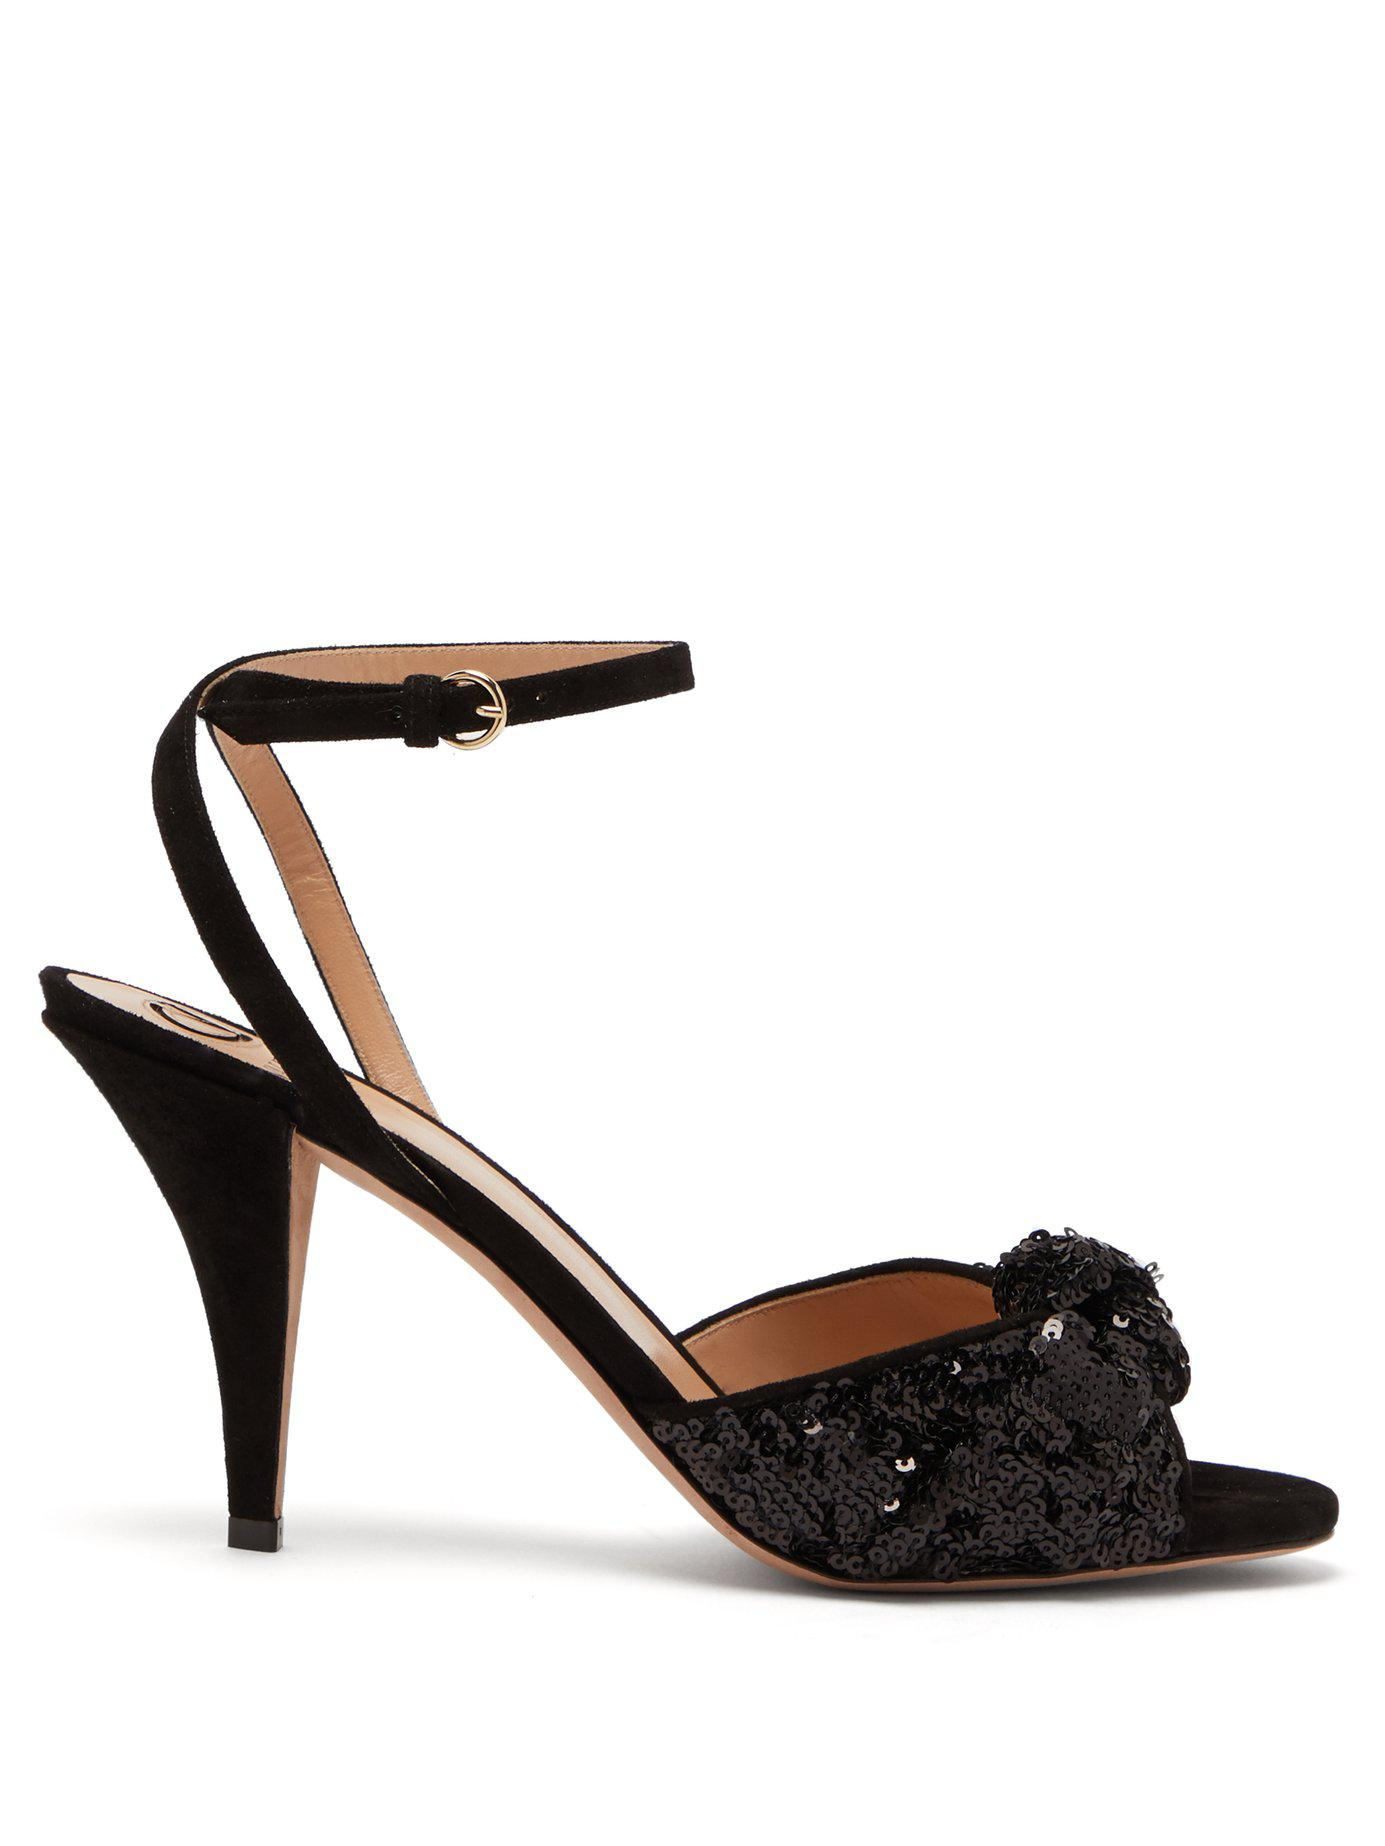 00ee6e51c74c2e Valentino Liquid Metal Glow Sequin Embellished Sandals in Black - Lyst